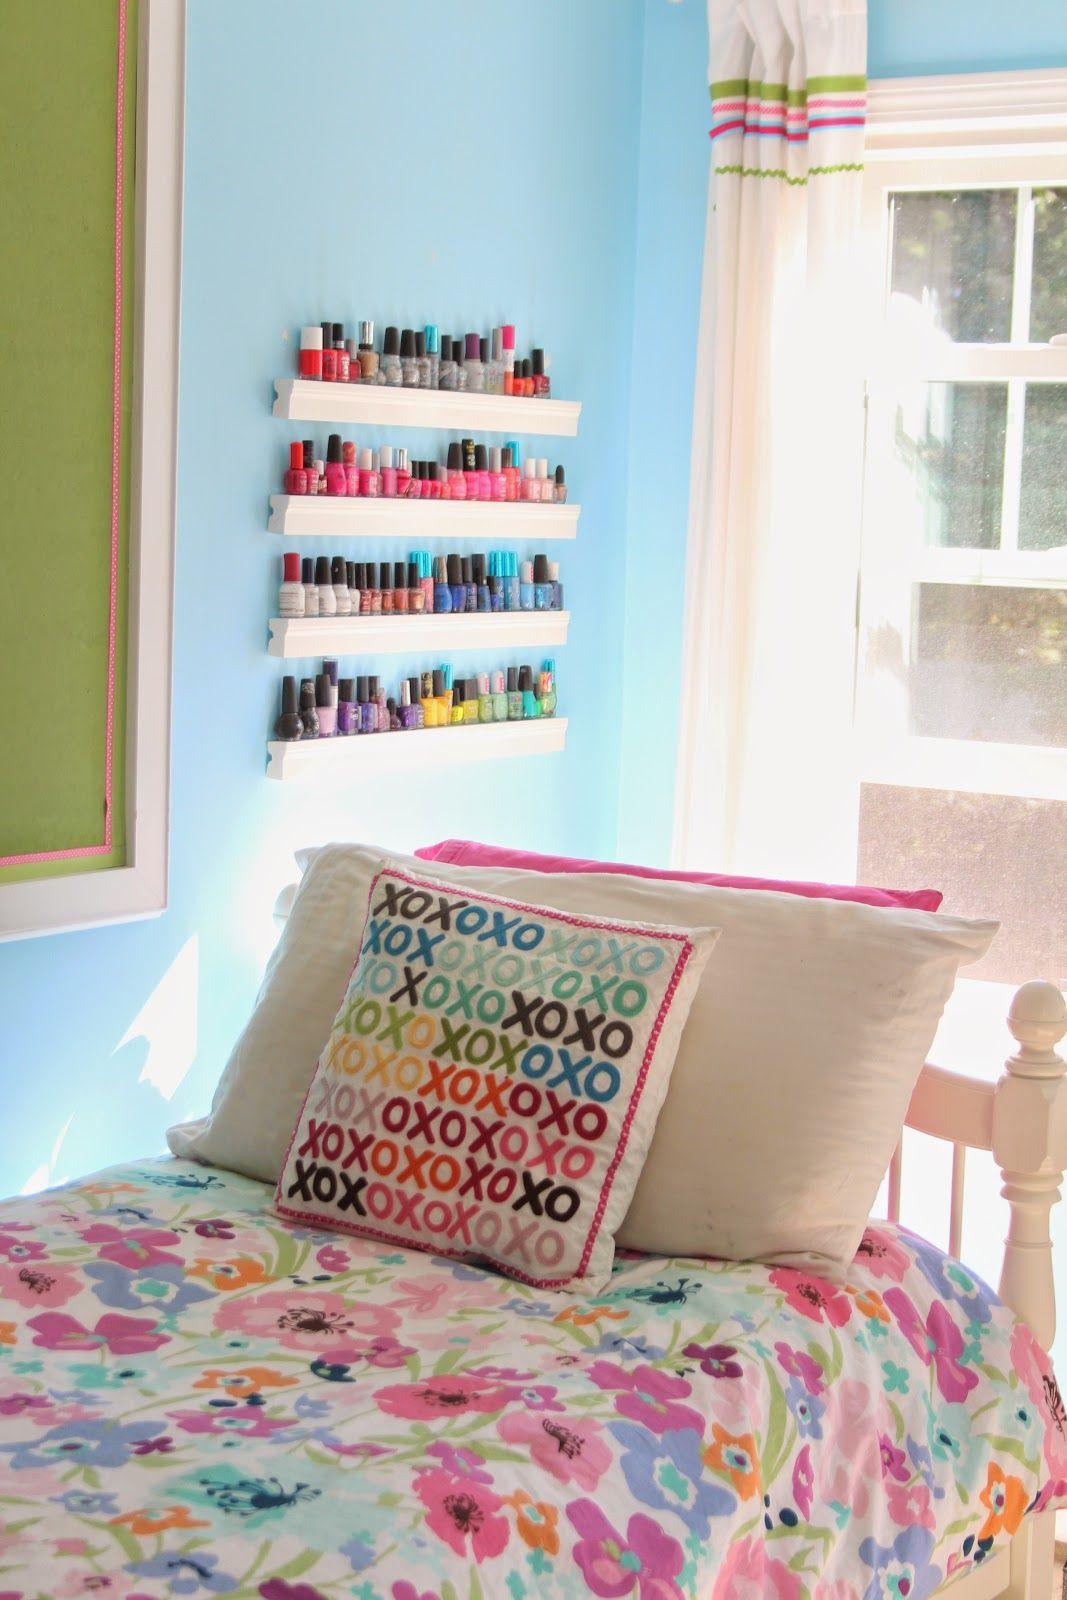 Diy Nail Polish Ledges Diy Projects For Bedroom Diy Room Decor